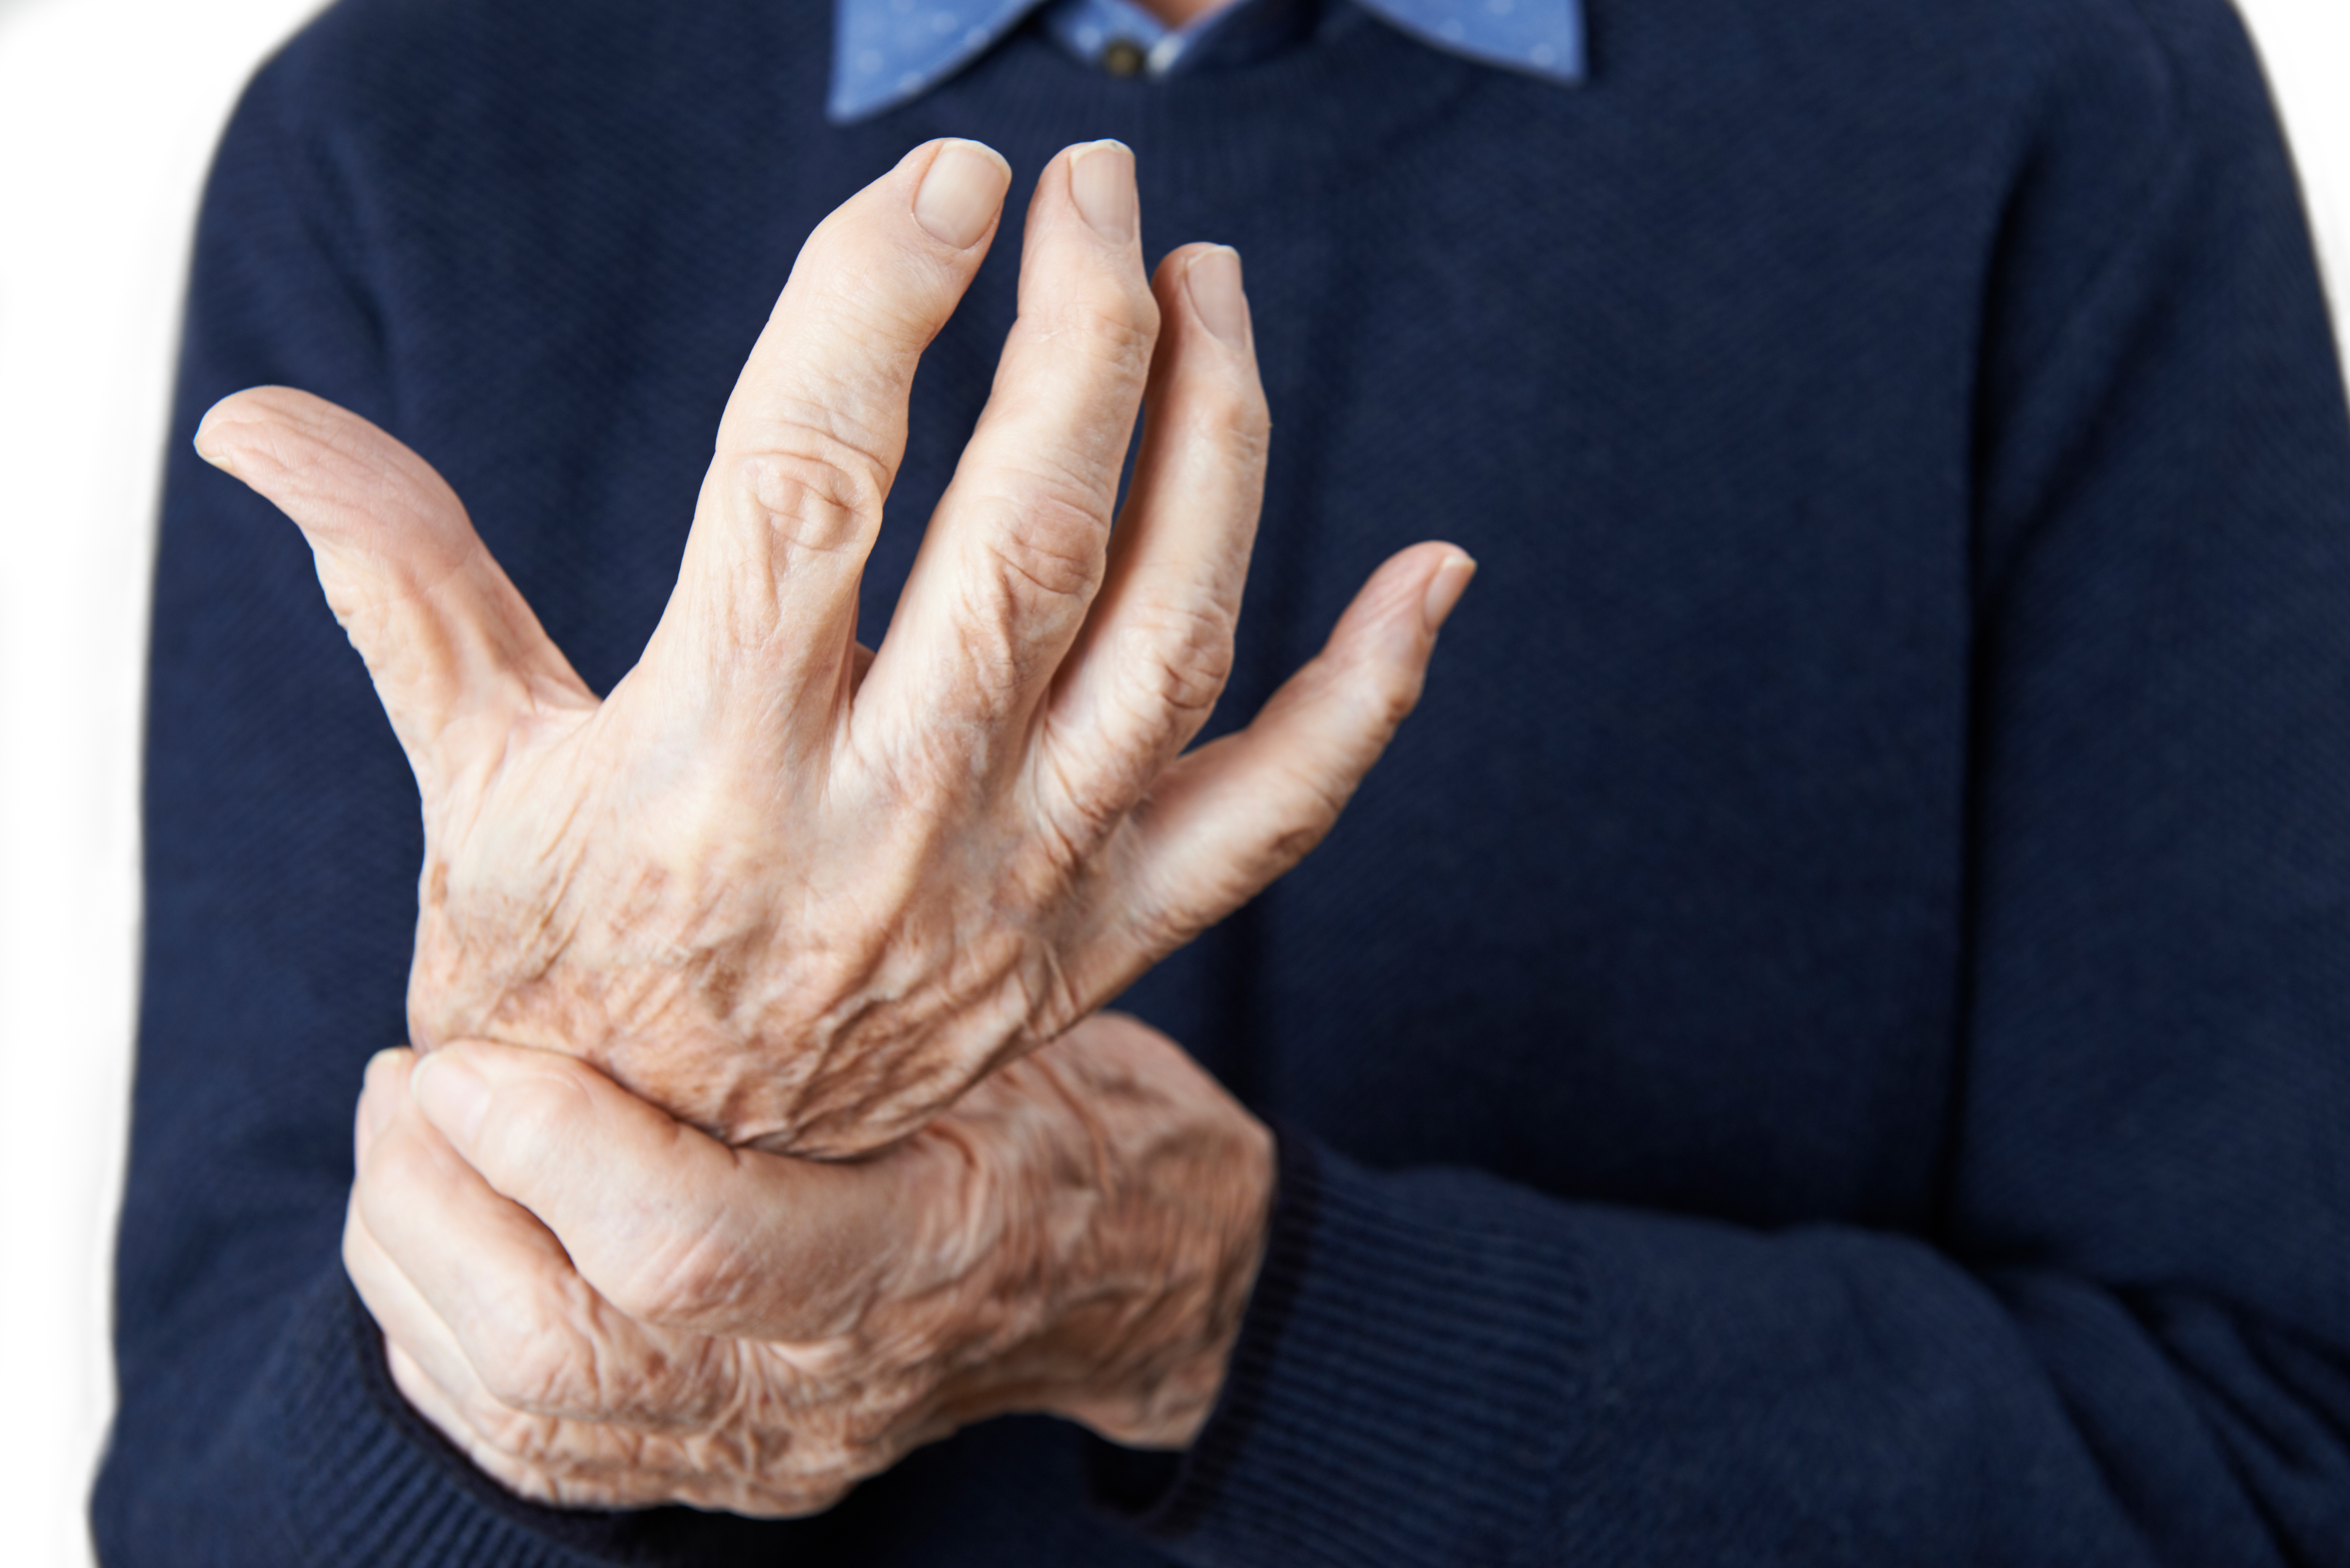 Close Up Of Senior Man Suffering With Osteoarthritis or Rhematoid Arthritis